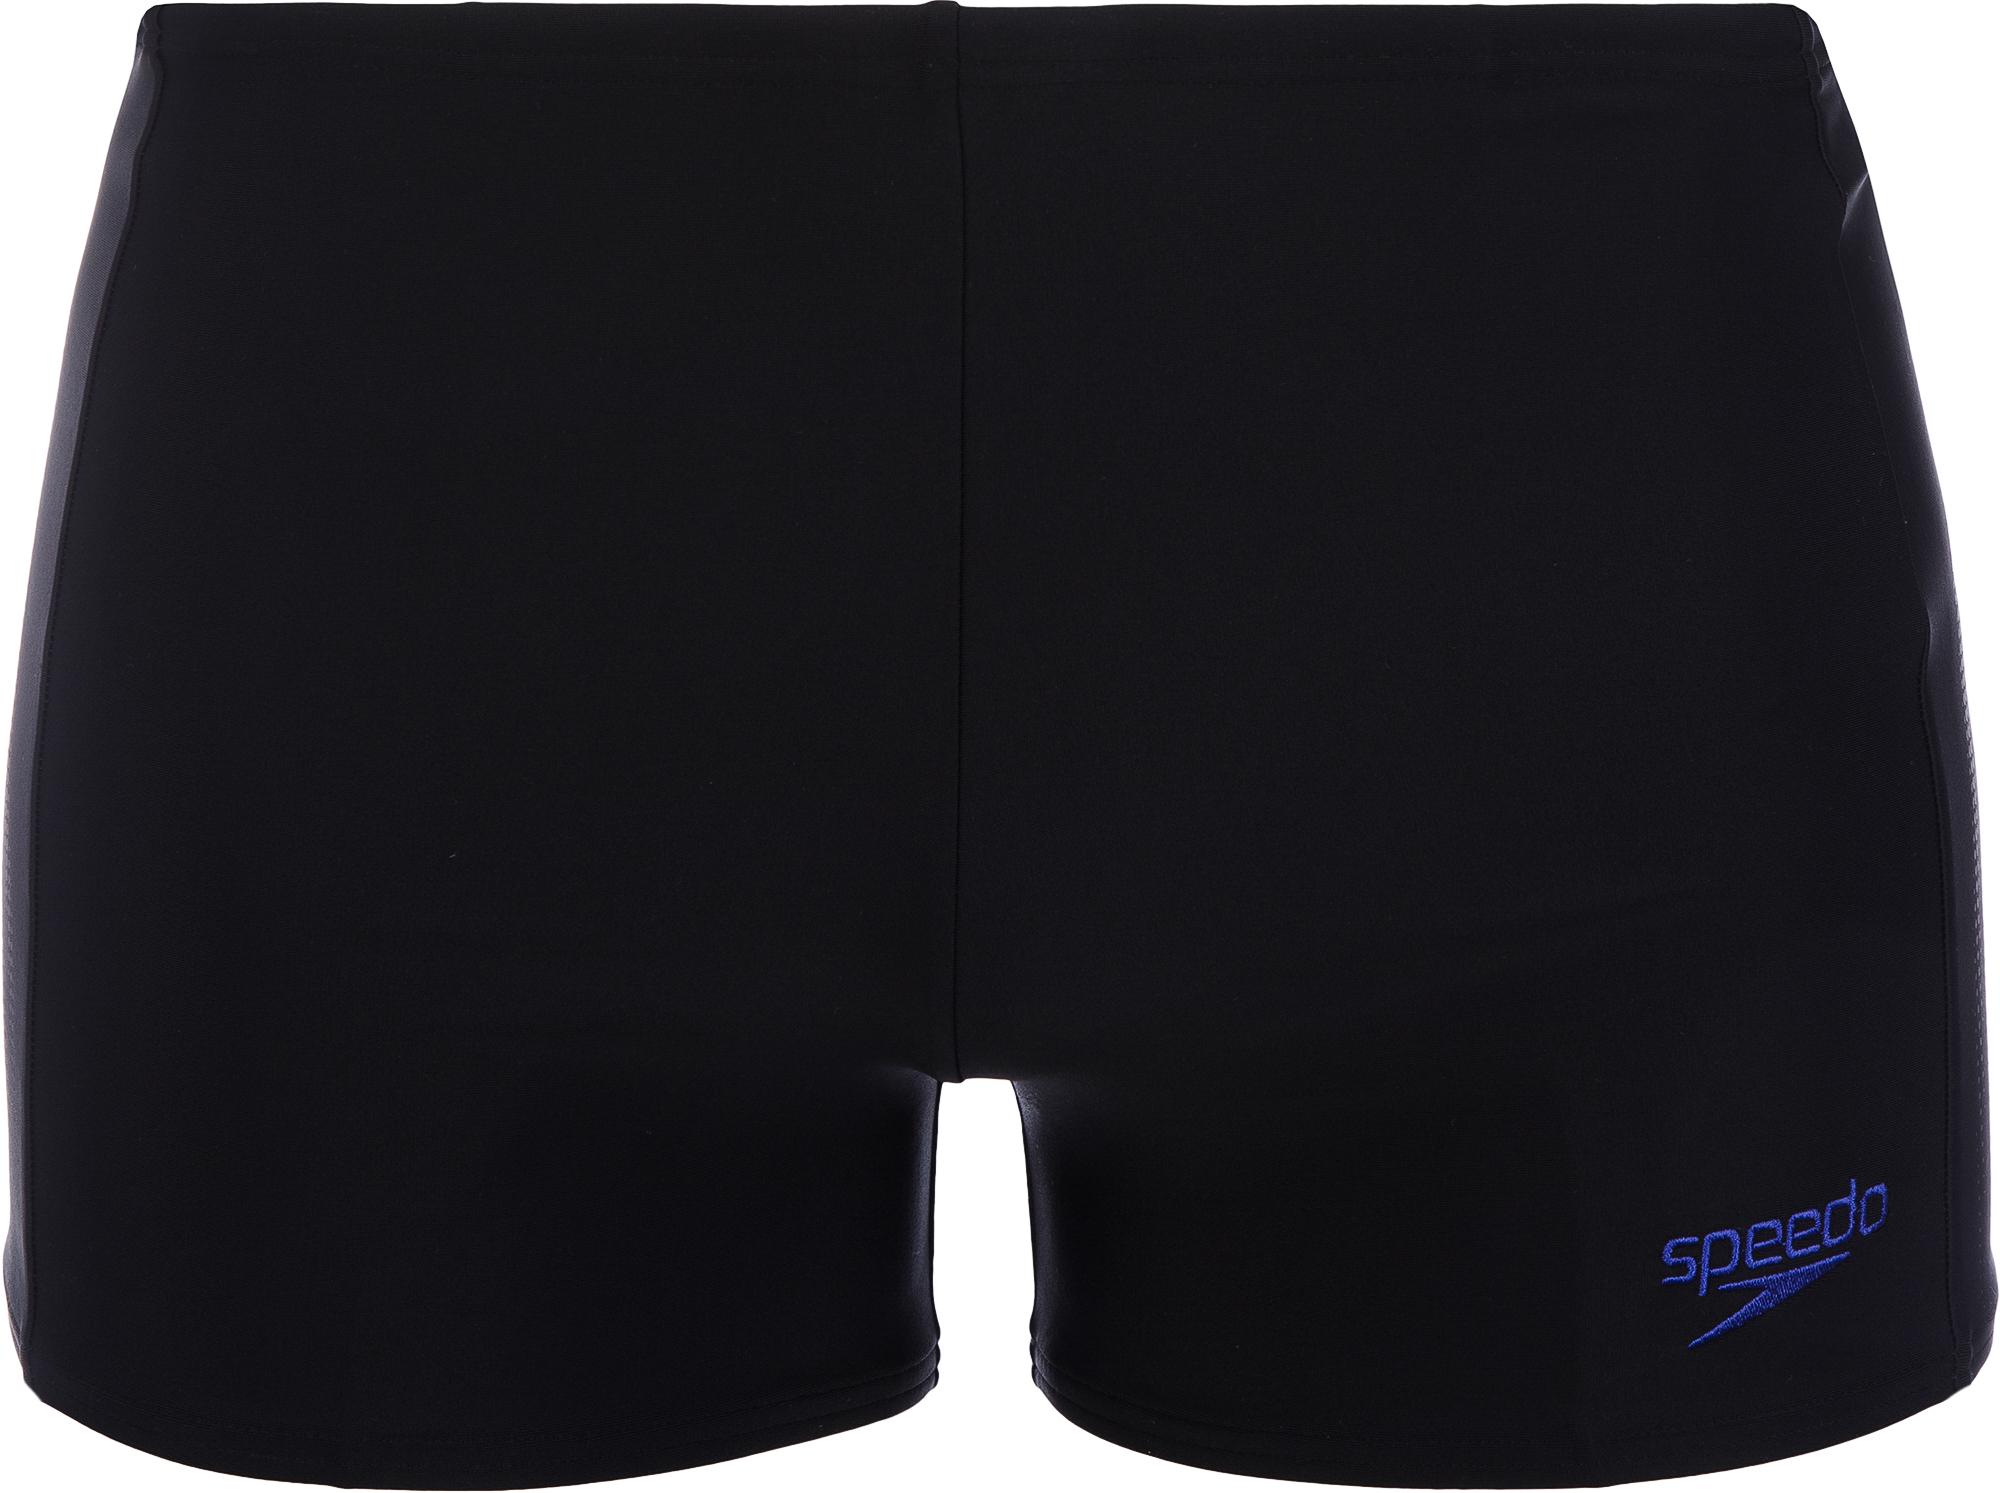 Speedo Плавки-шорты мужские Speedo Sptmas Pnl, размер 52-54 стоимость